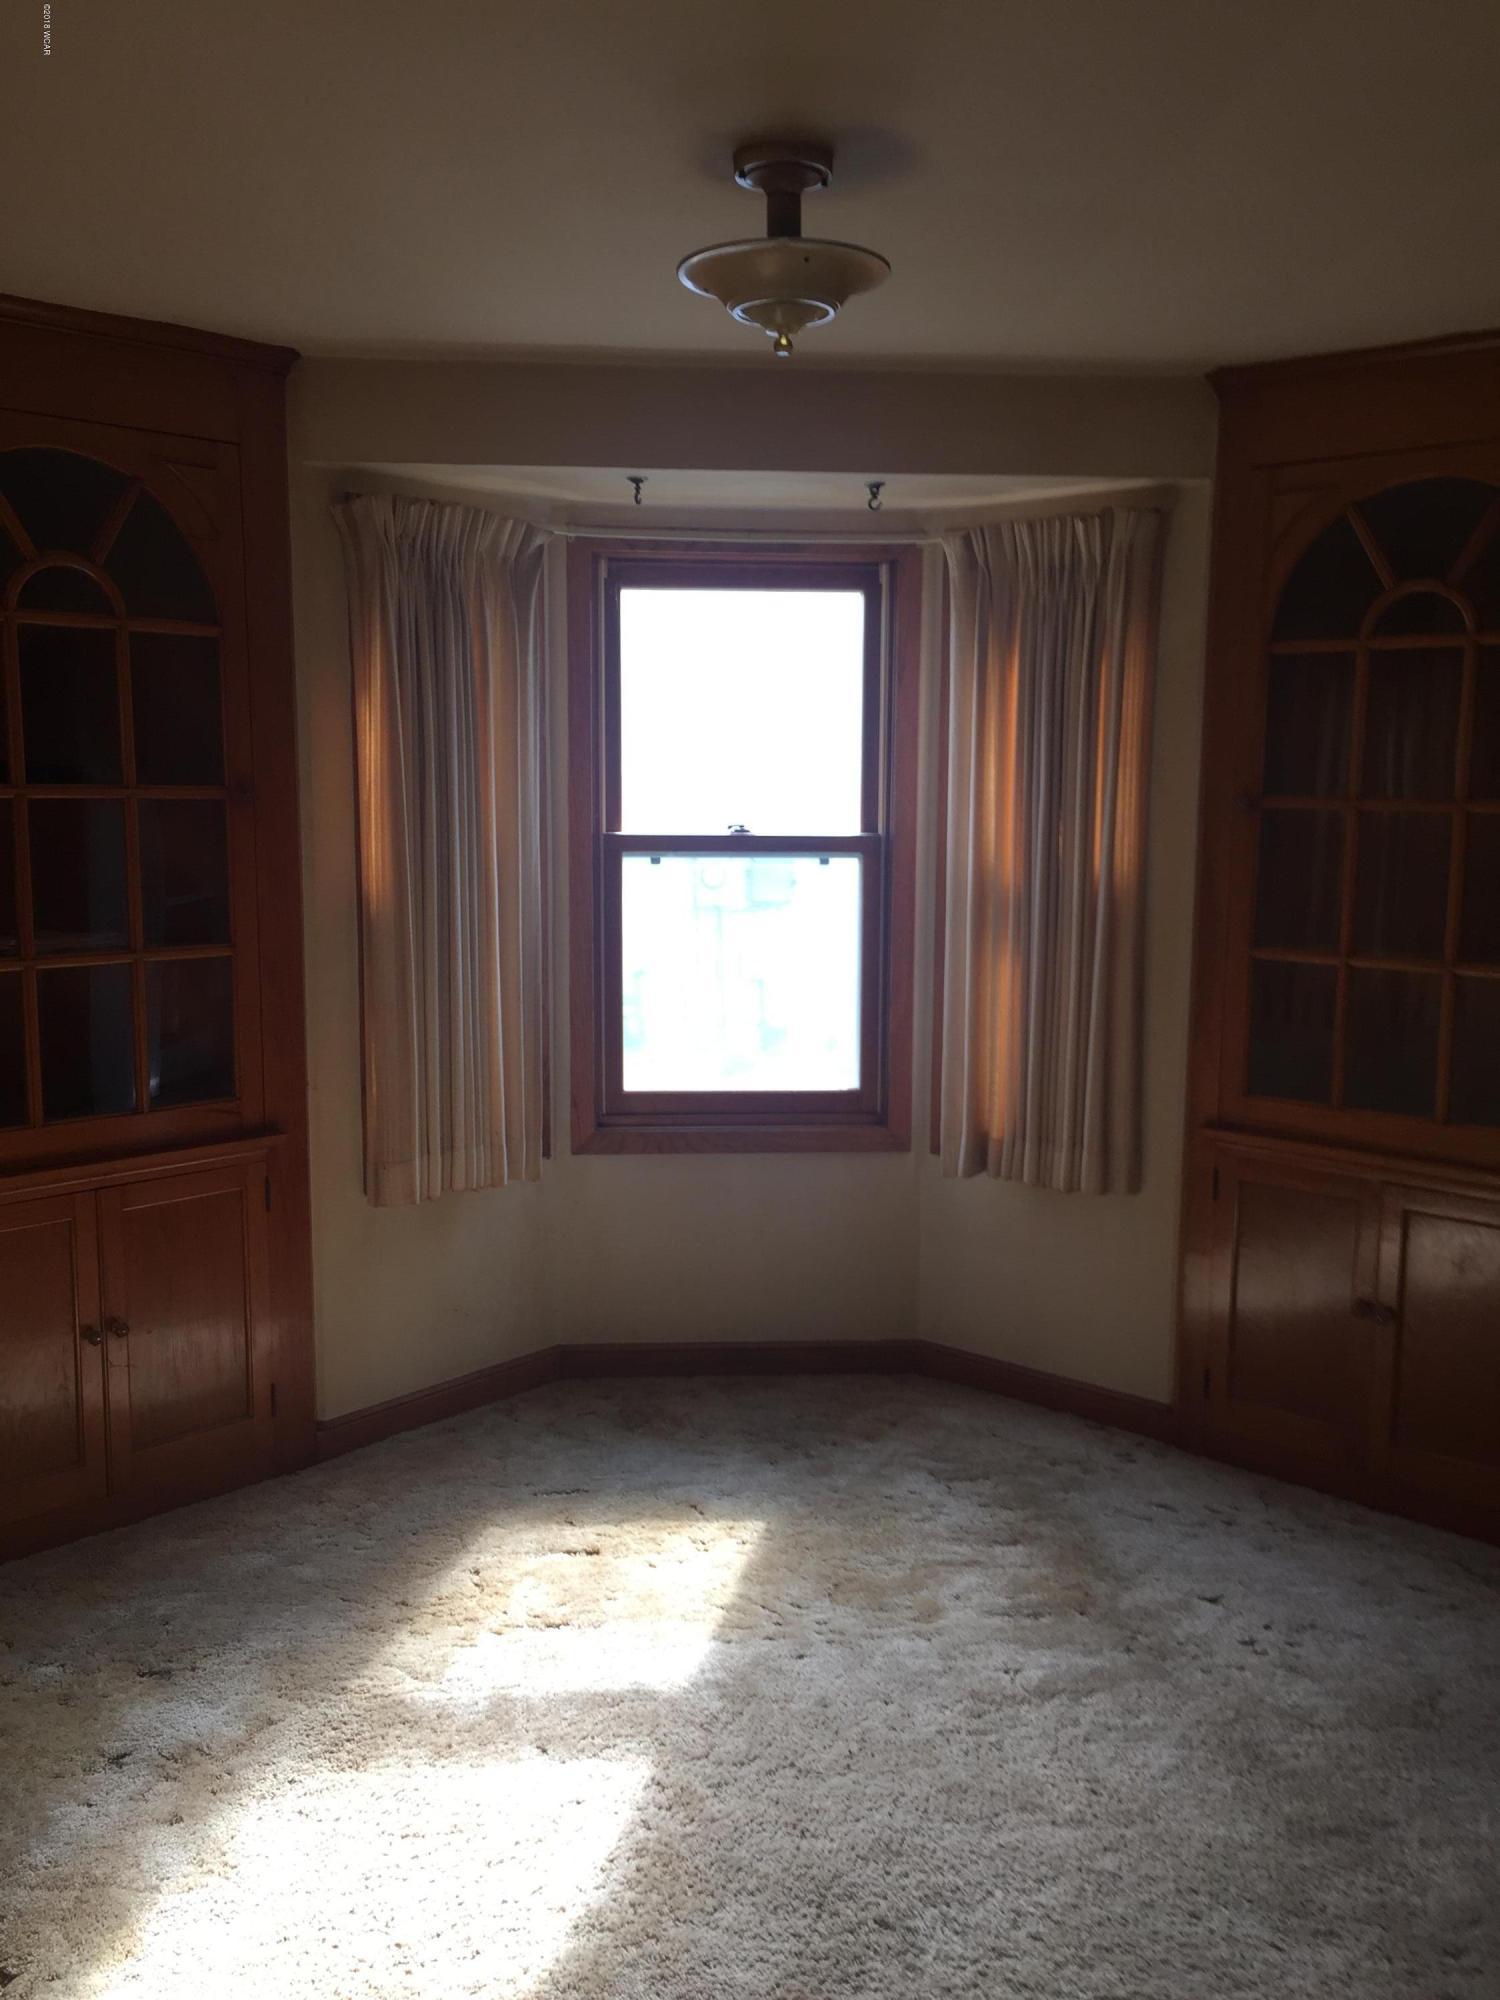 920 6th Street,Willmar,3 Bedrooms Bedrooms,1 BathroomBathrooms,Single Family,6th Street,6032658